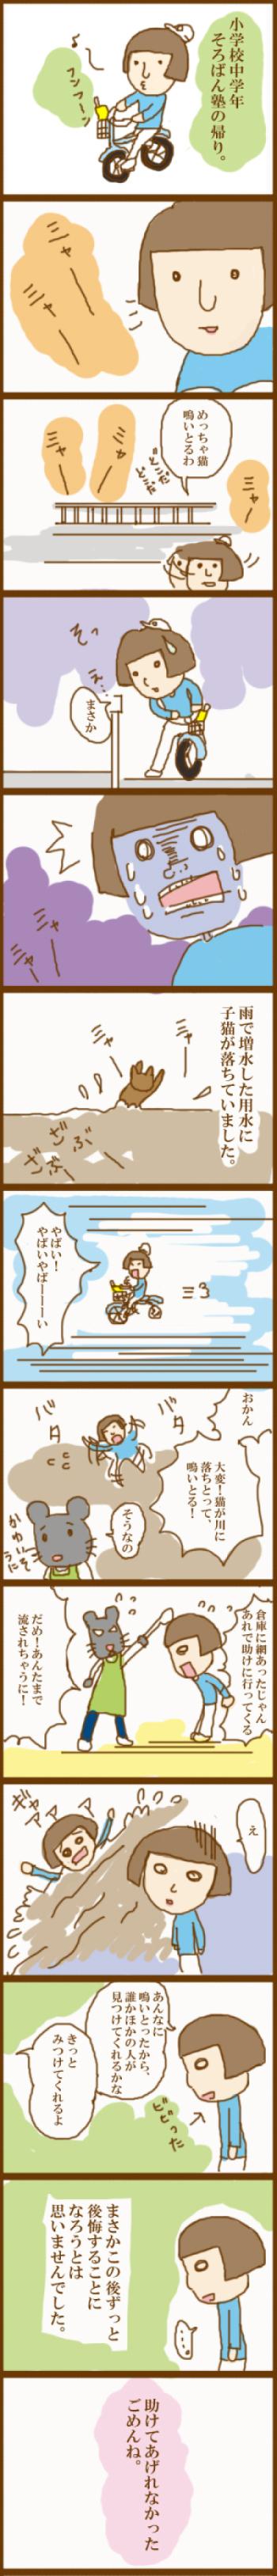 f:id:suzuokayu:20201011194204j:plain